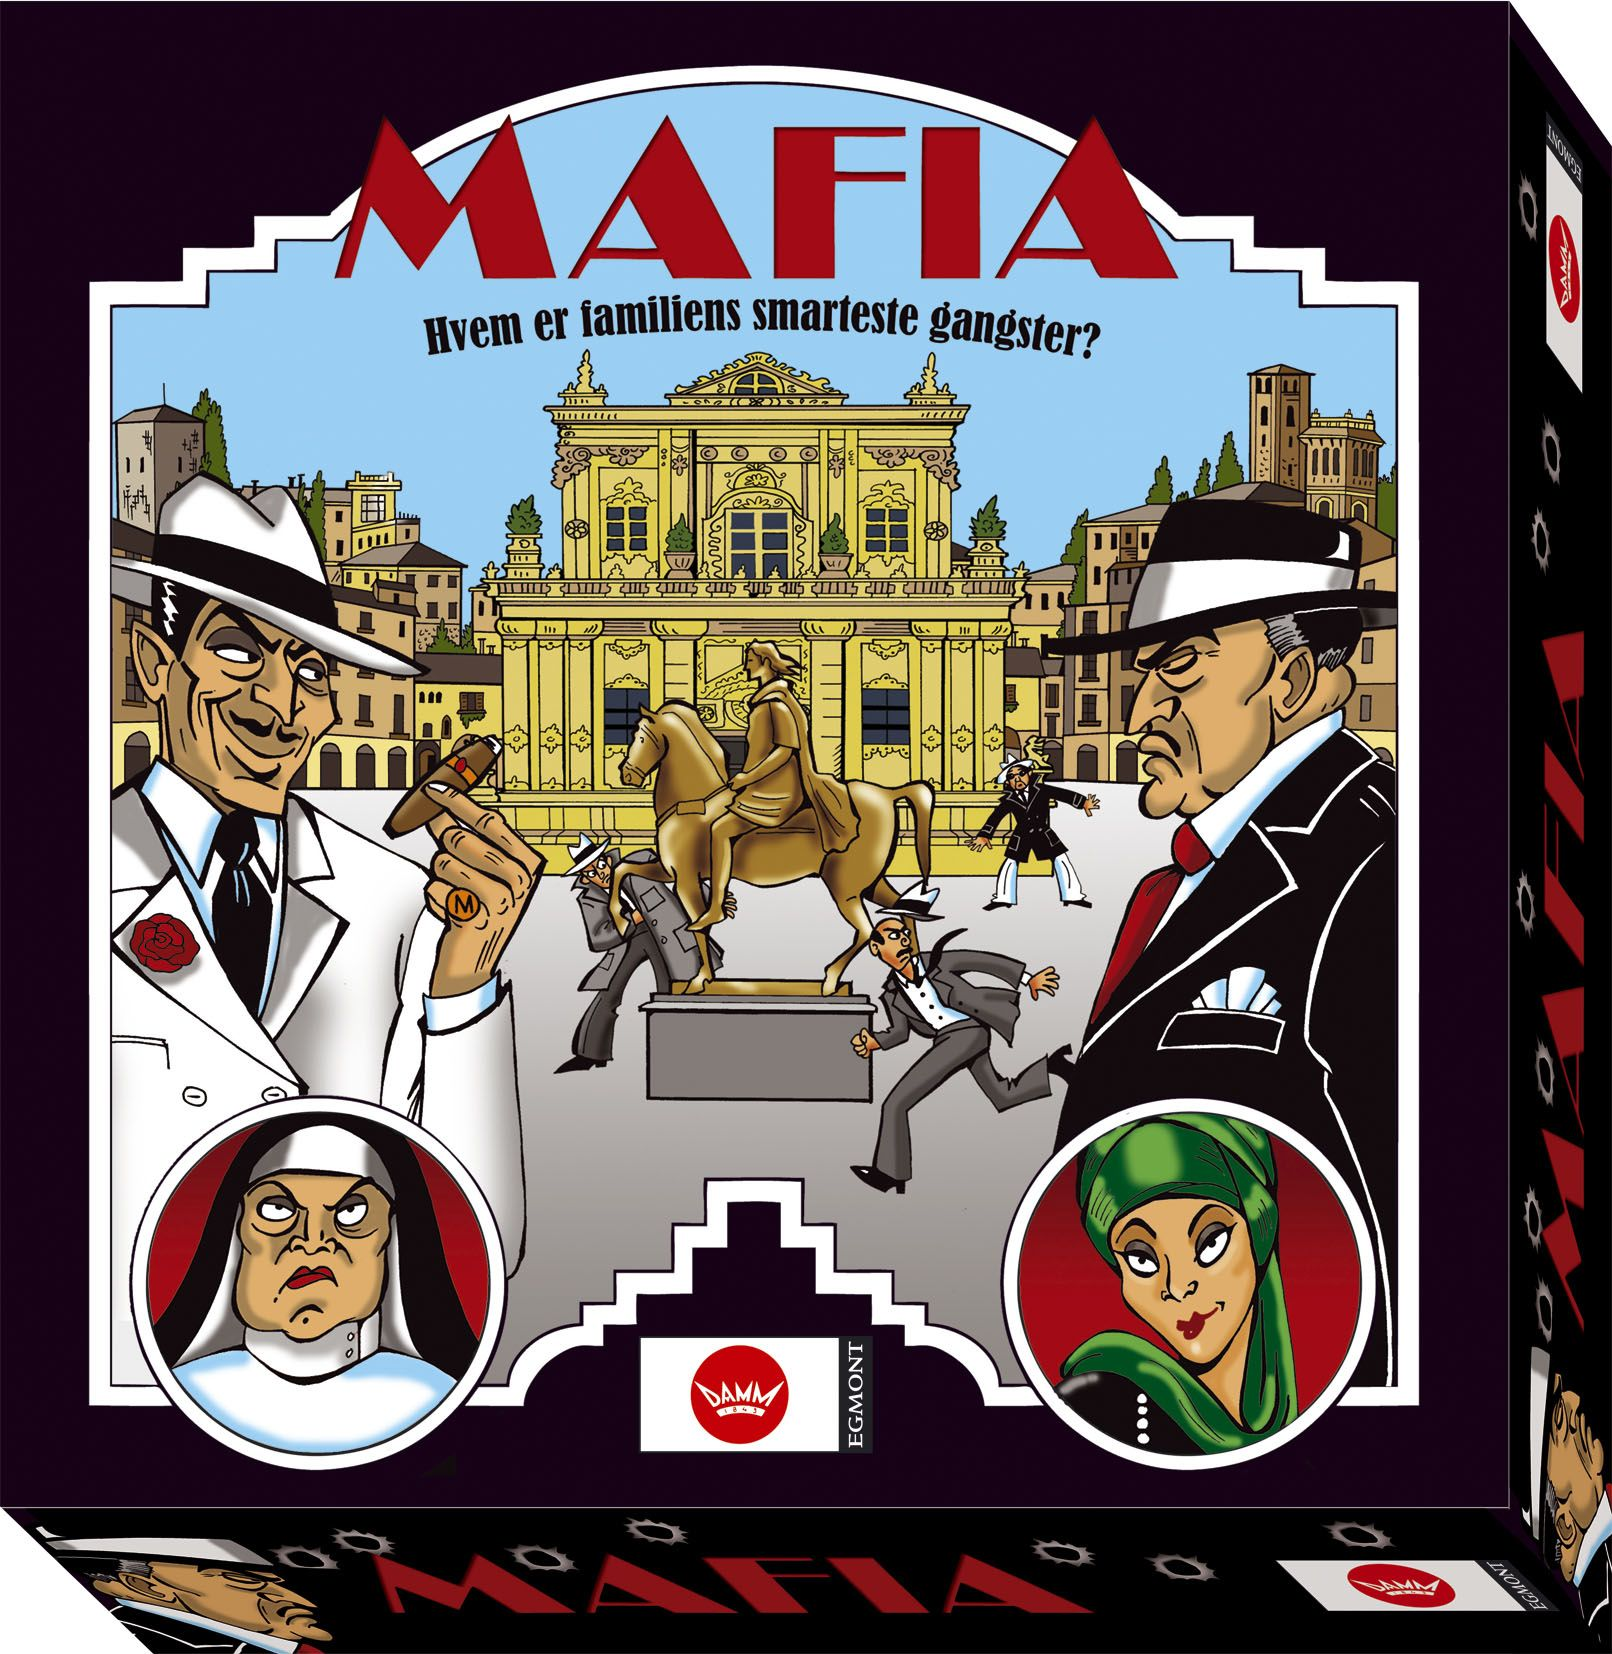 Pin by raki on gangster Mafia, Mafia families, Board games